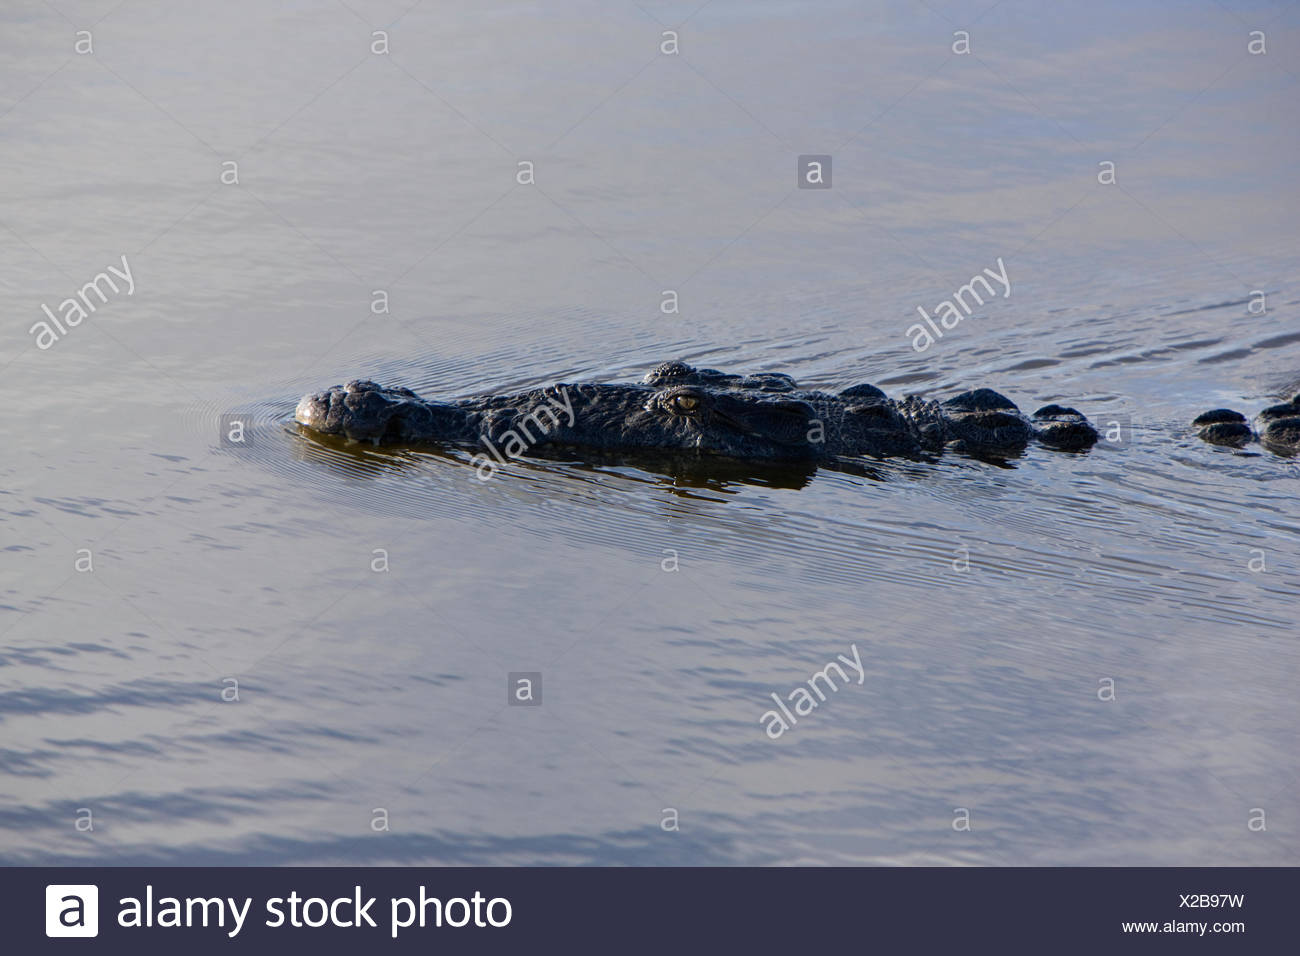 alligatoridae America american American alligator color image crocodiles crocodiles and allies everglades national park Florida - Stock Image